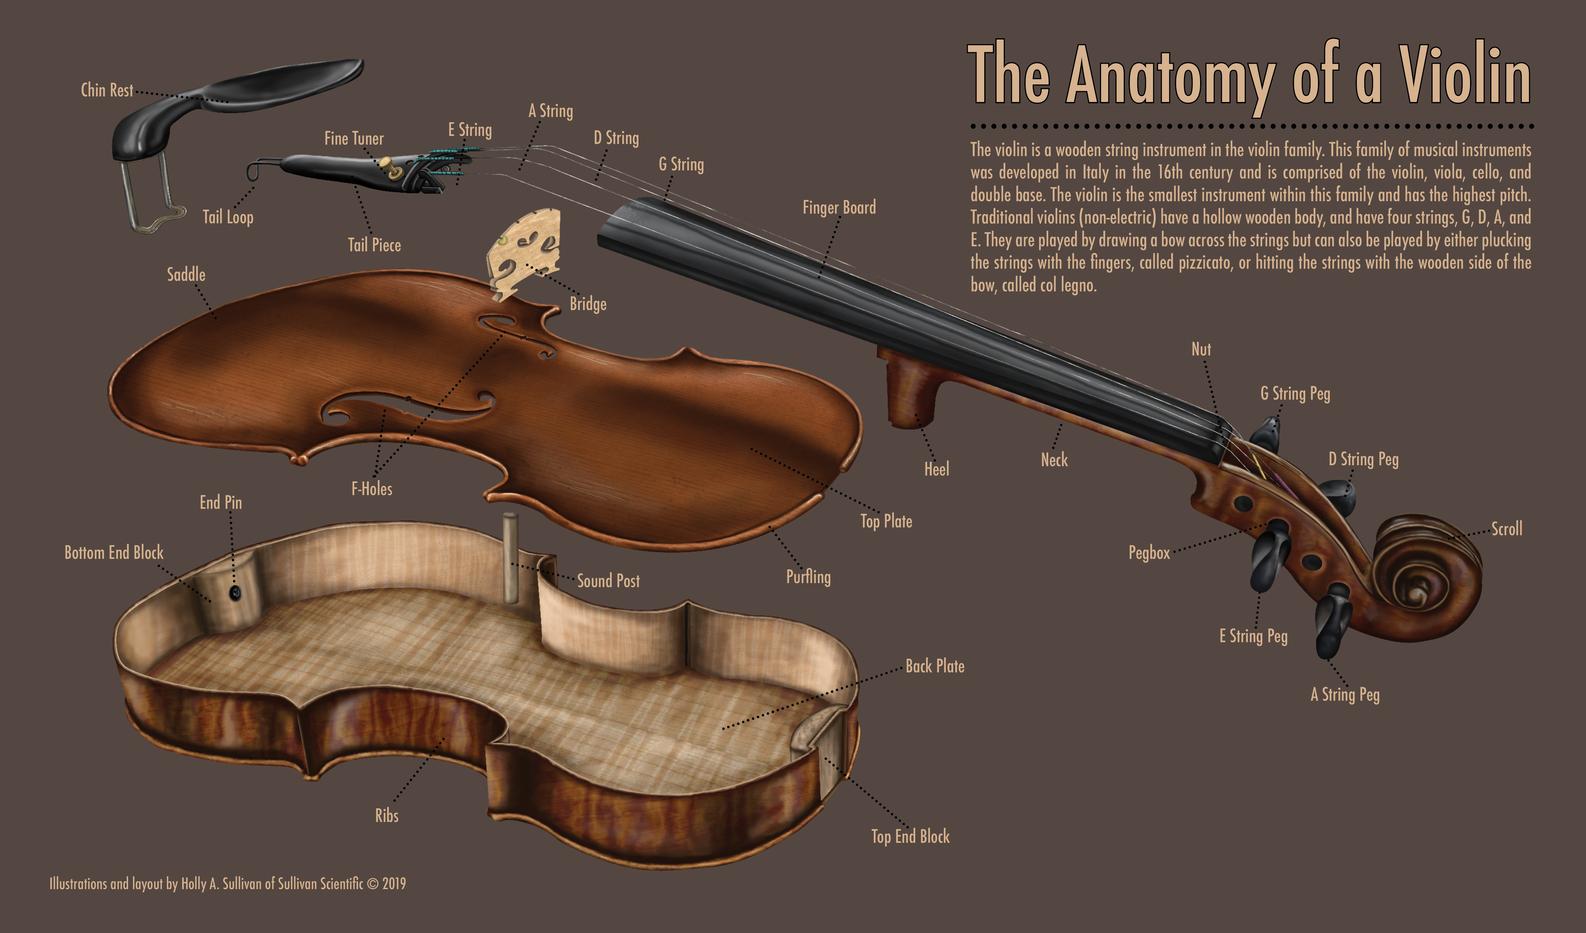 The Anatomy of a Violin